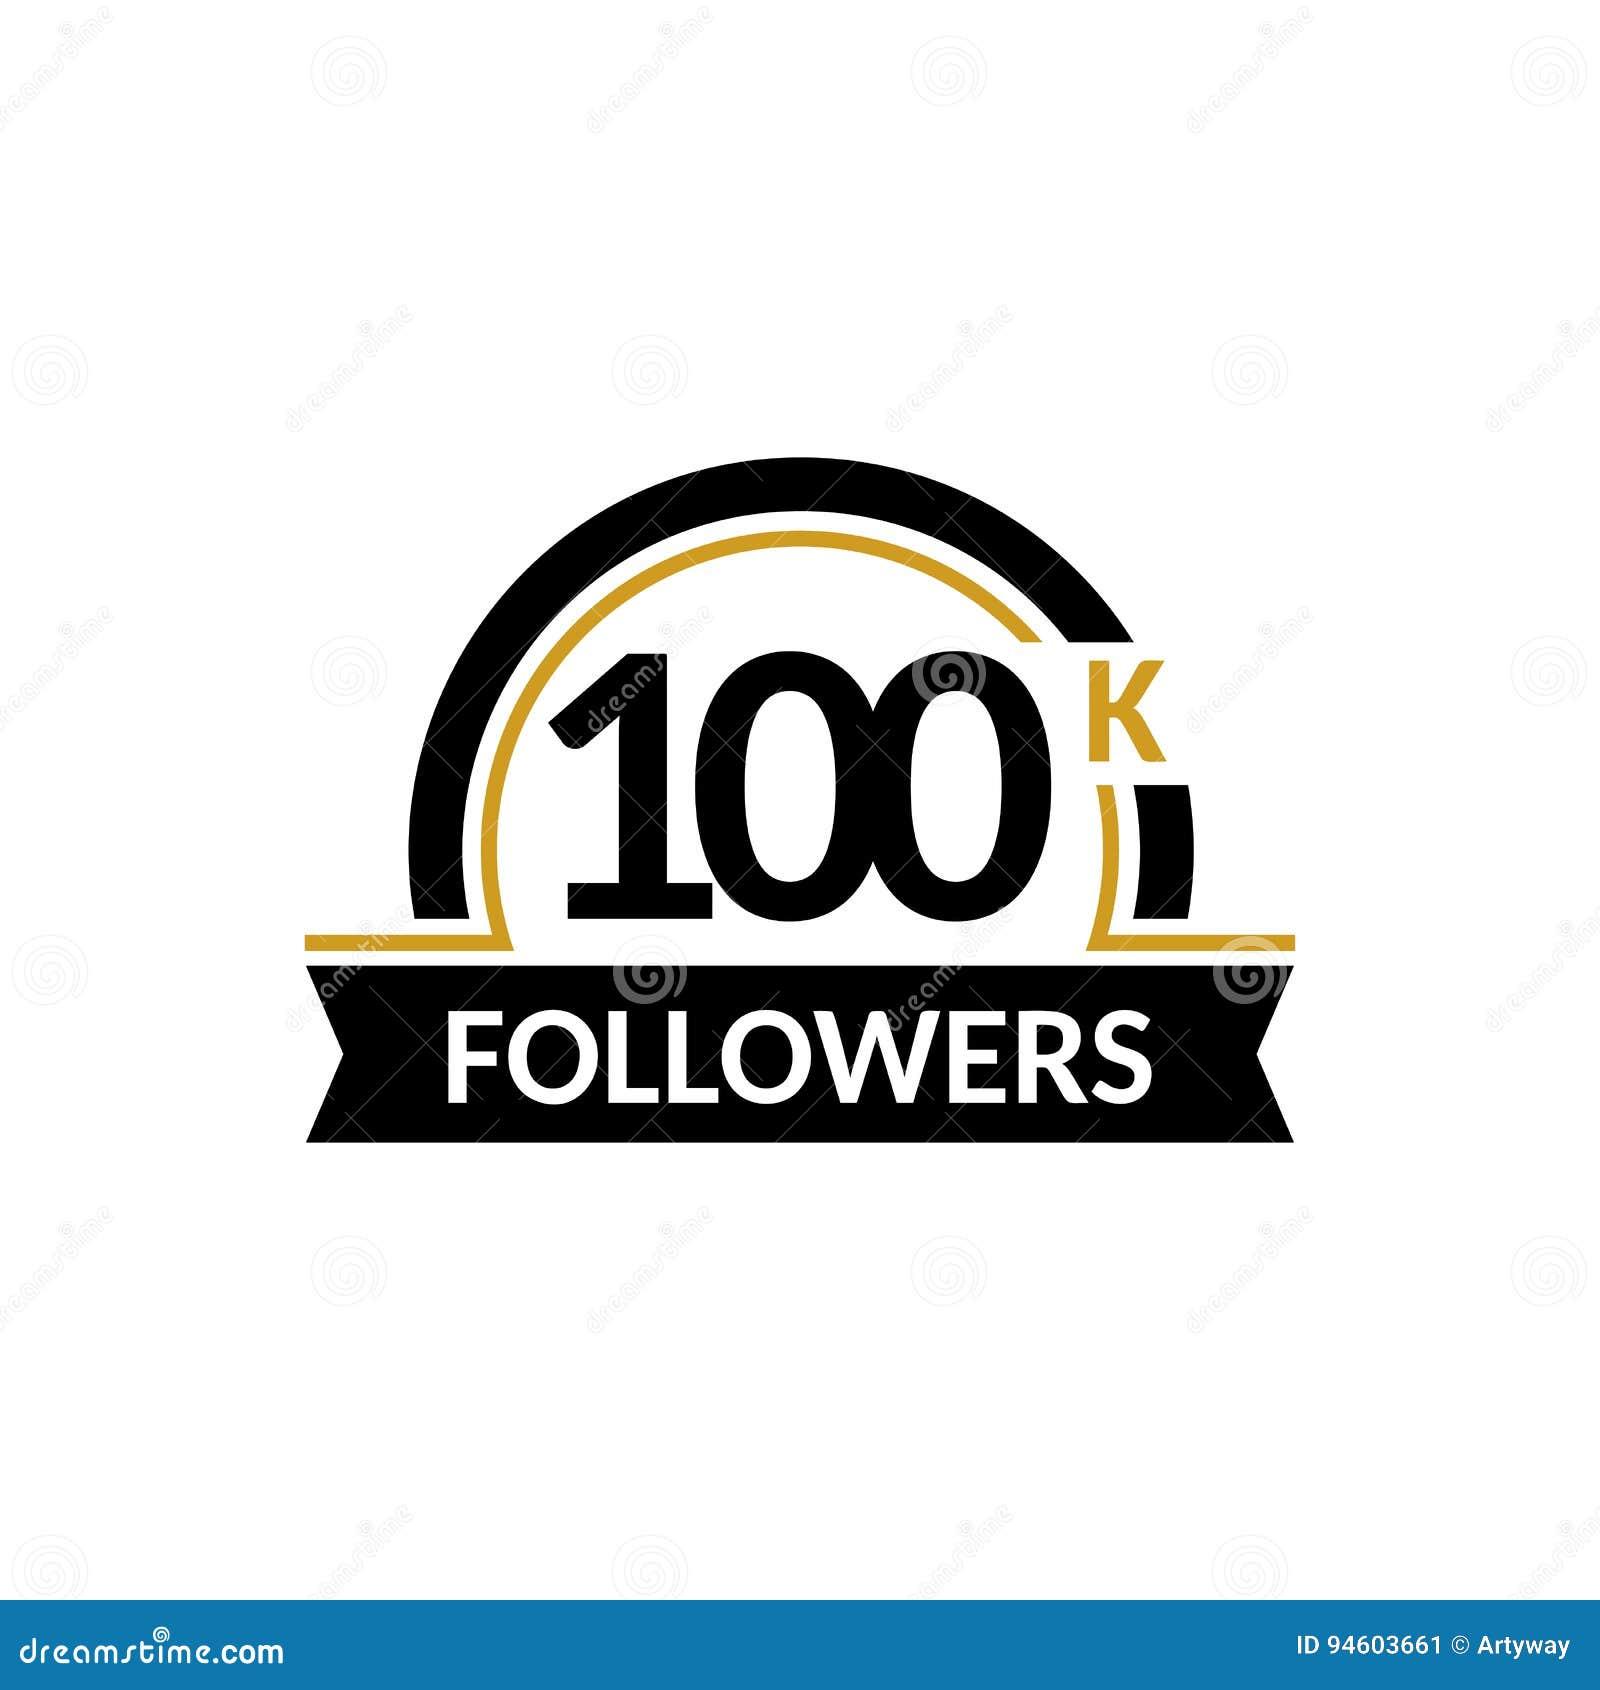 100000 followers and friends 100k anniversary congratulations